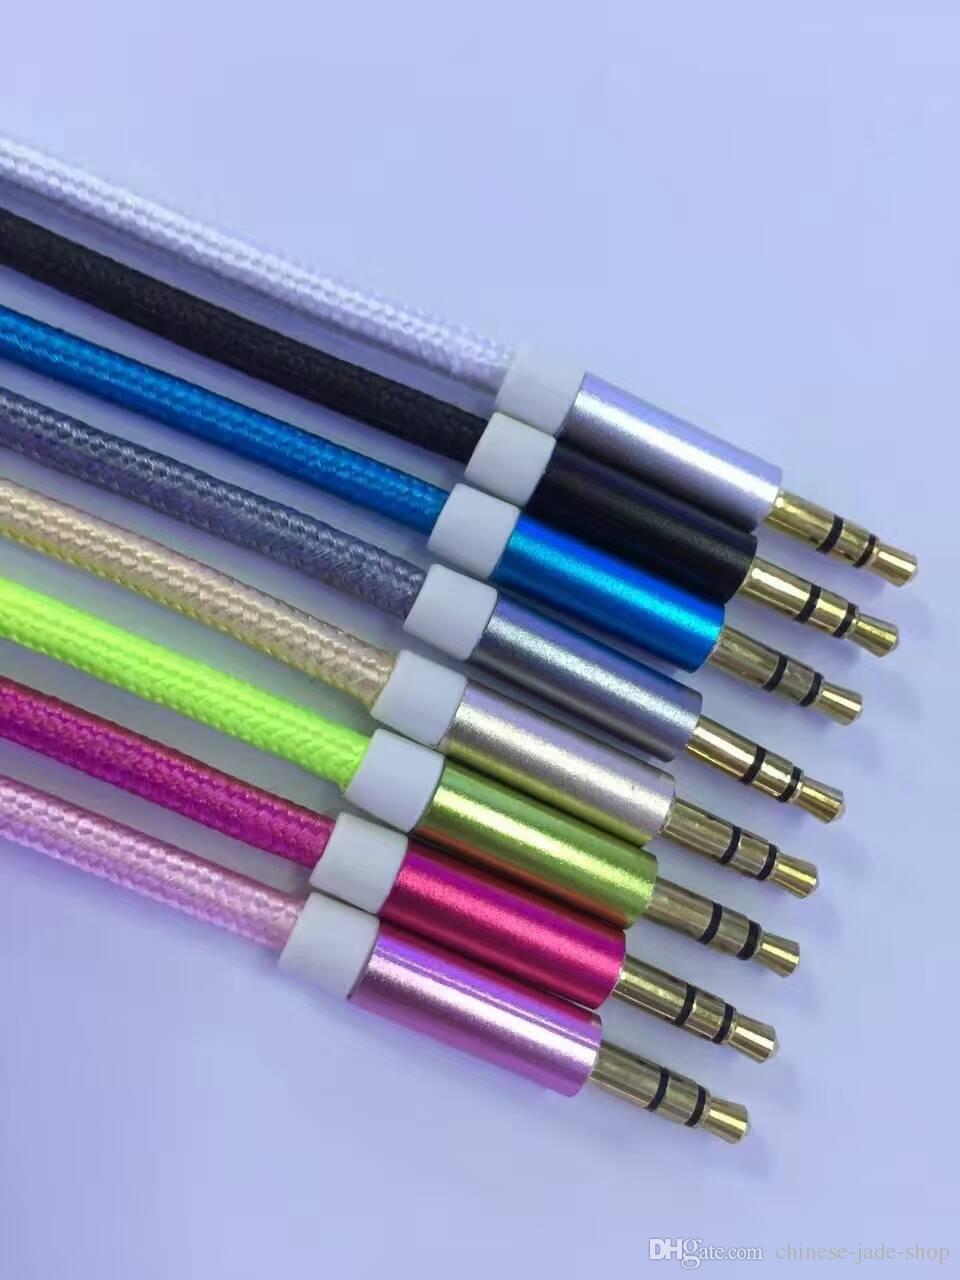 Pure kleur aluminium metalen adapter nylon gevlochten koord 3.5mm stereo audio aux kabel 1m 3ft od3.8mm 100pcs / lot